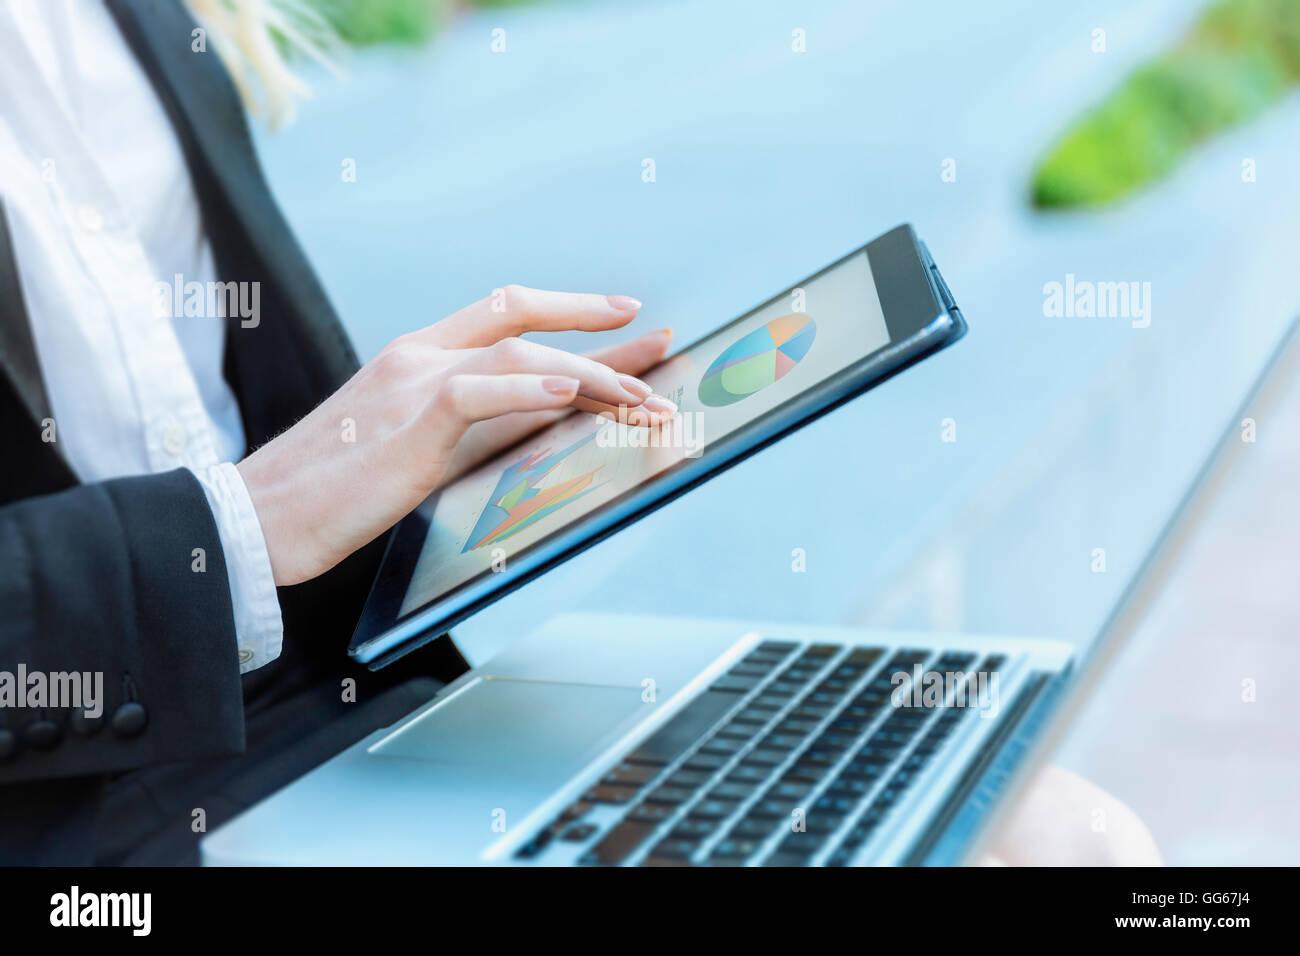 Businesswoman using digital tablet - Stock Image